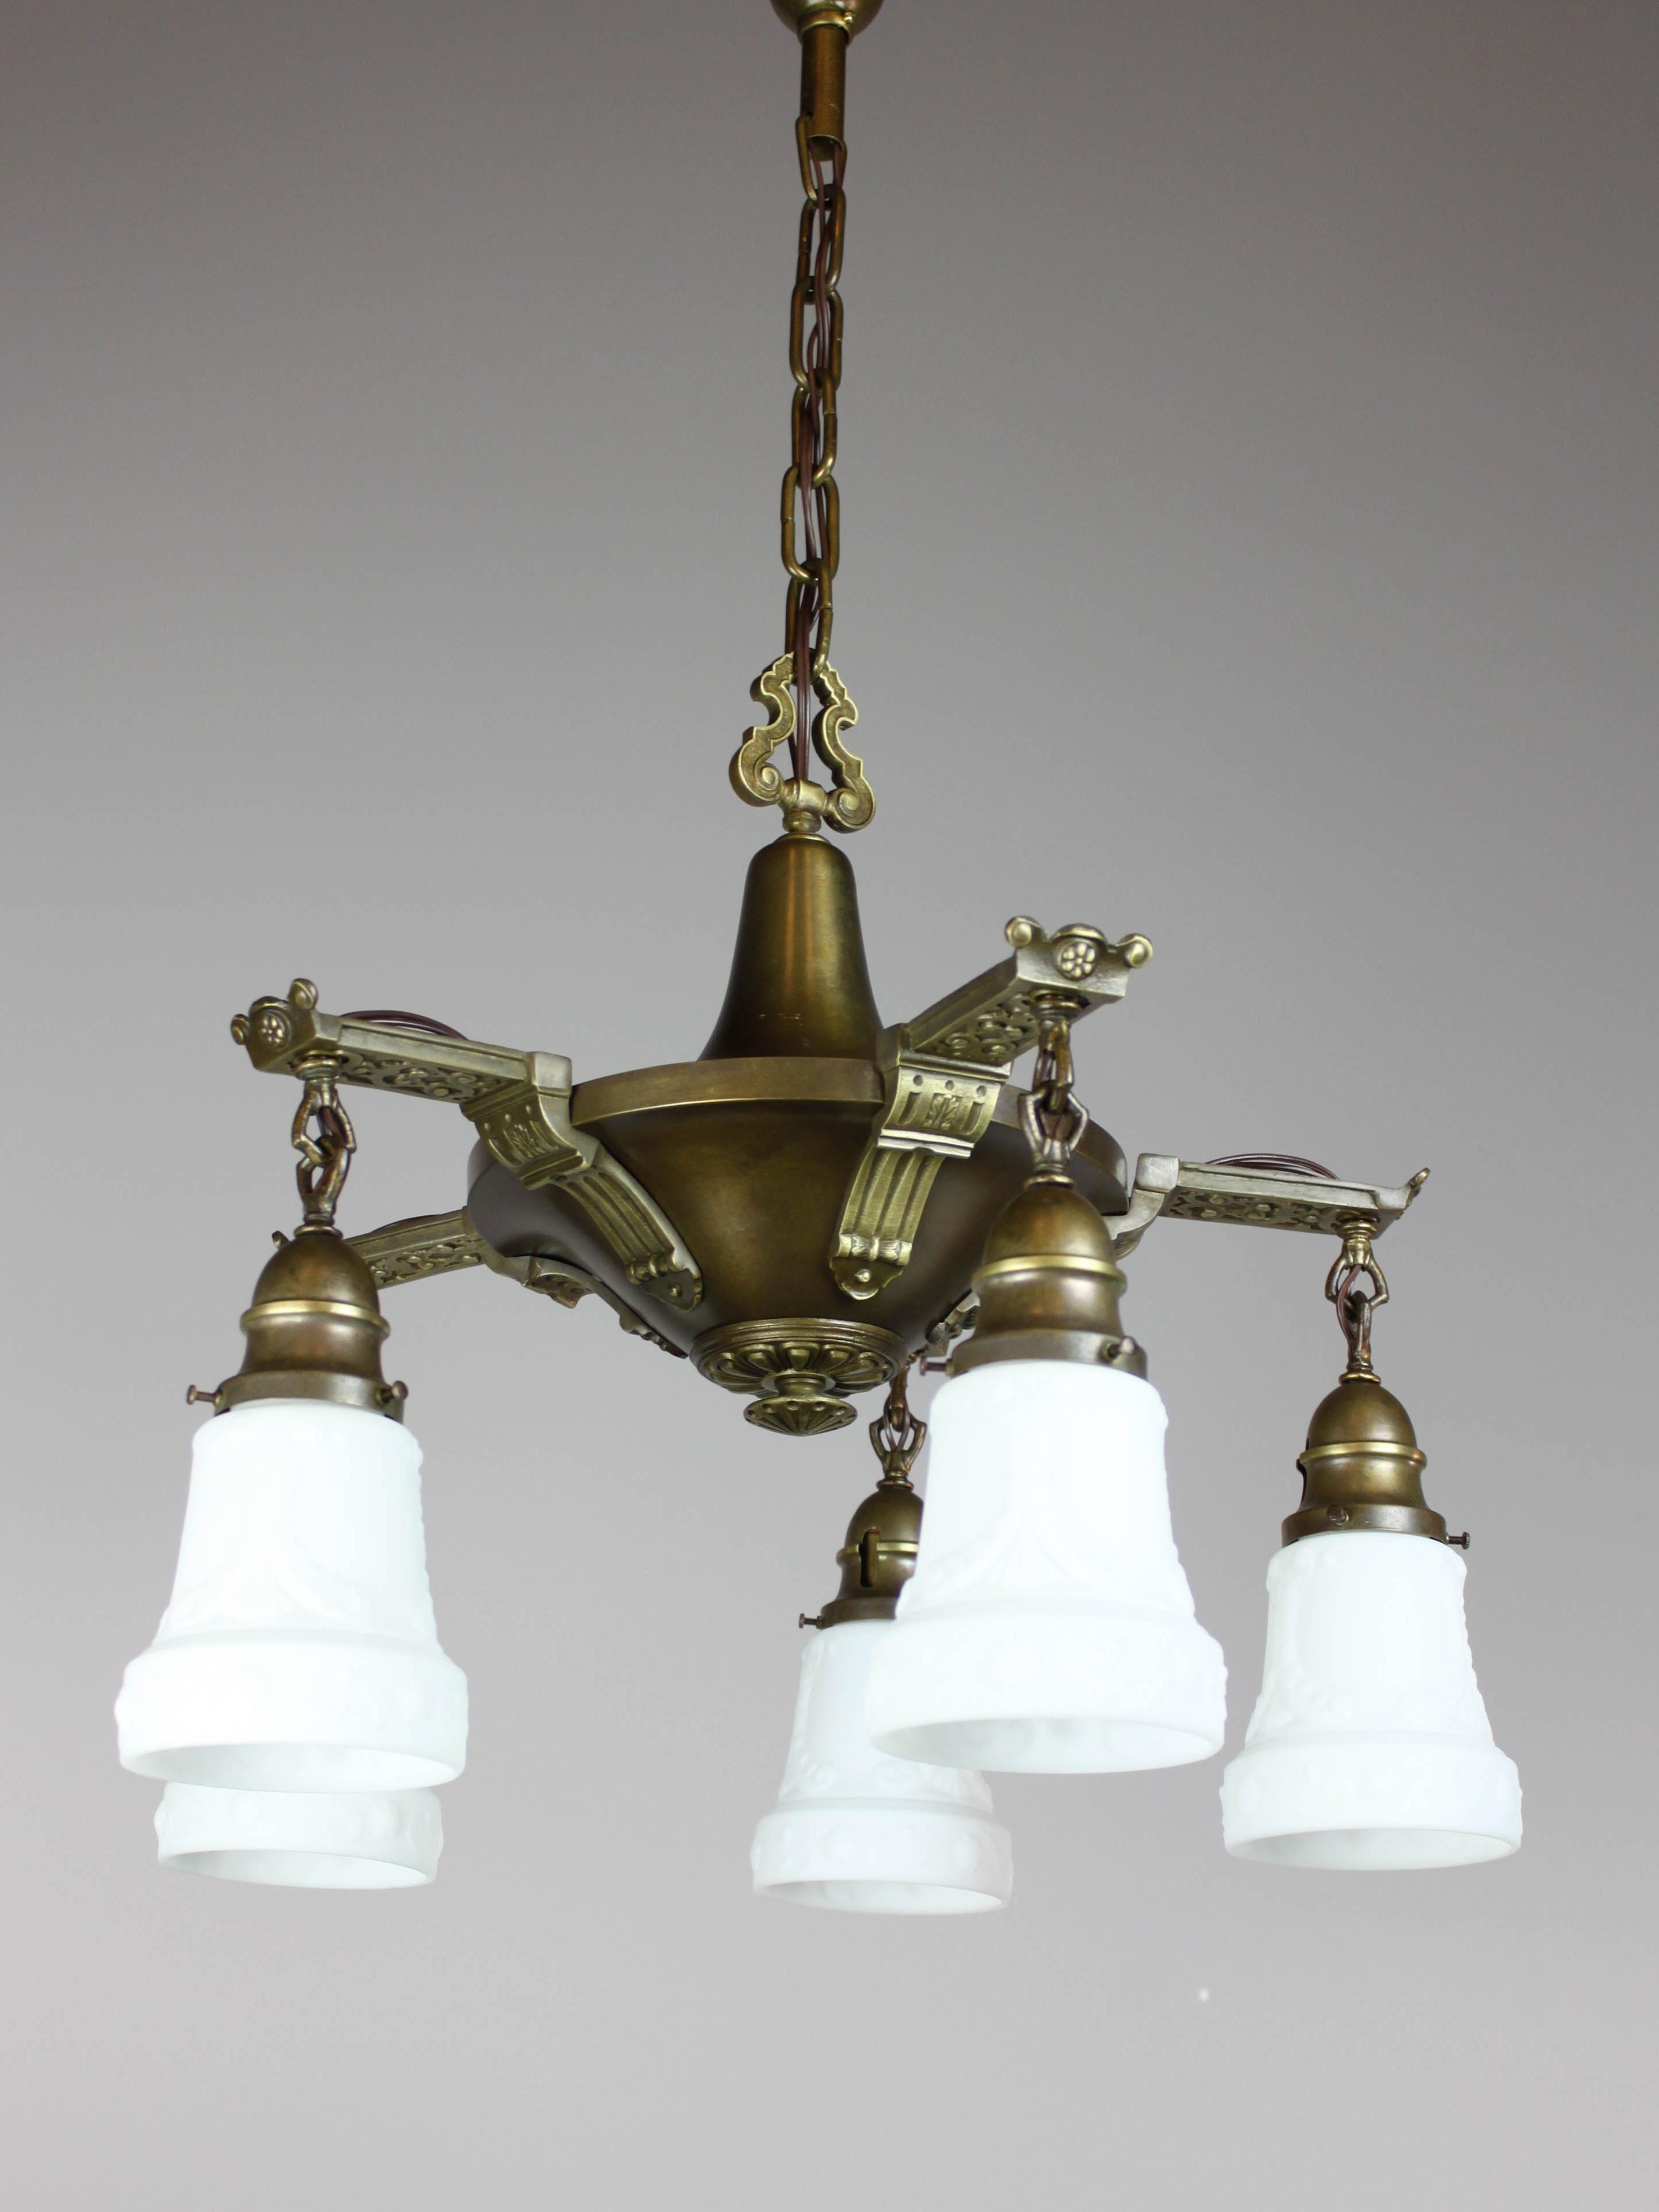 Current Edwardian Chandelier Regarding Antique Edwardian Pan Light Fixture (5 Light) (View 7 of 15)